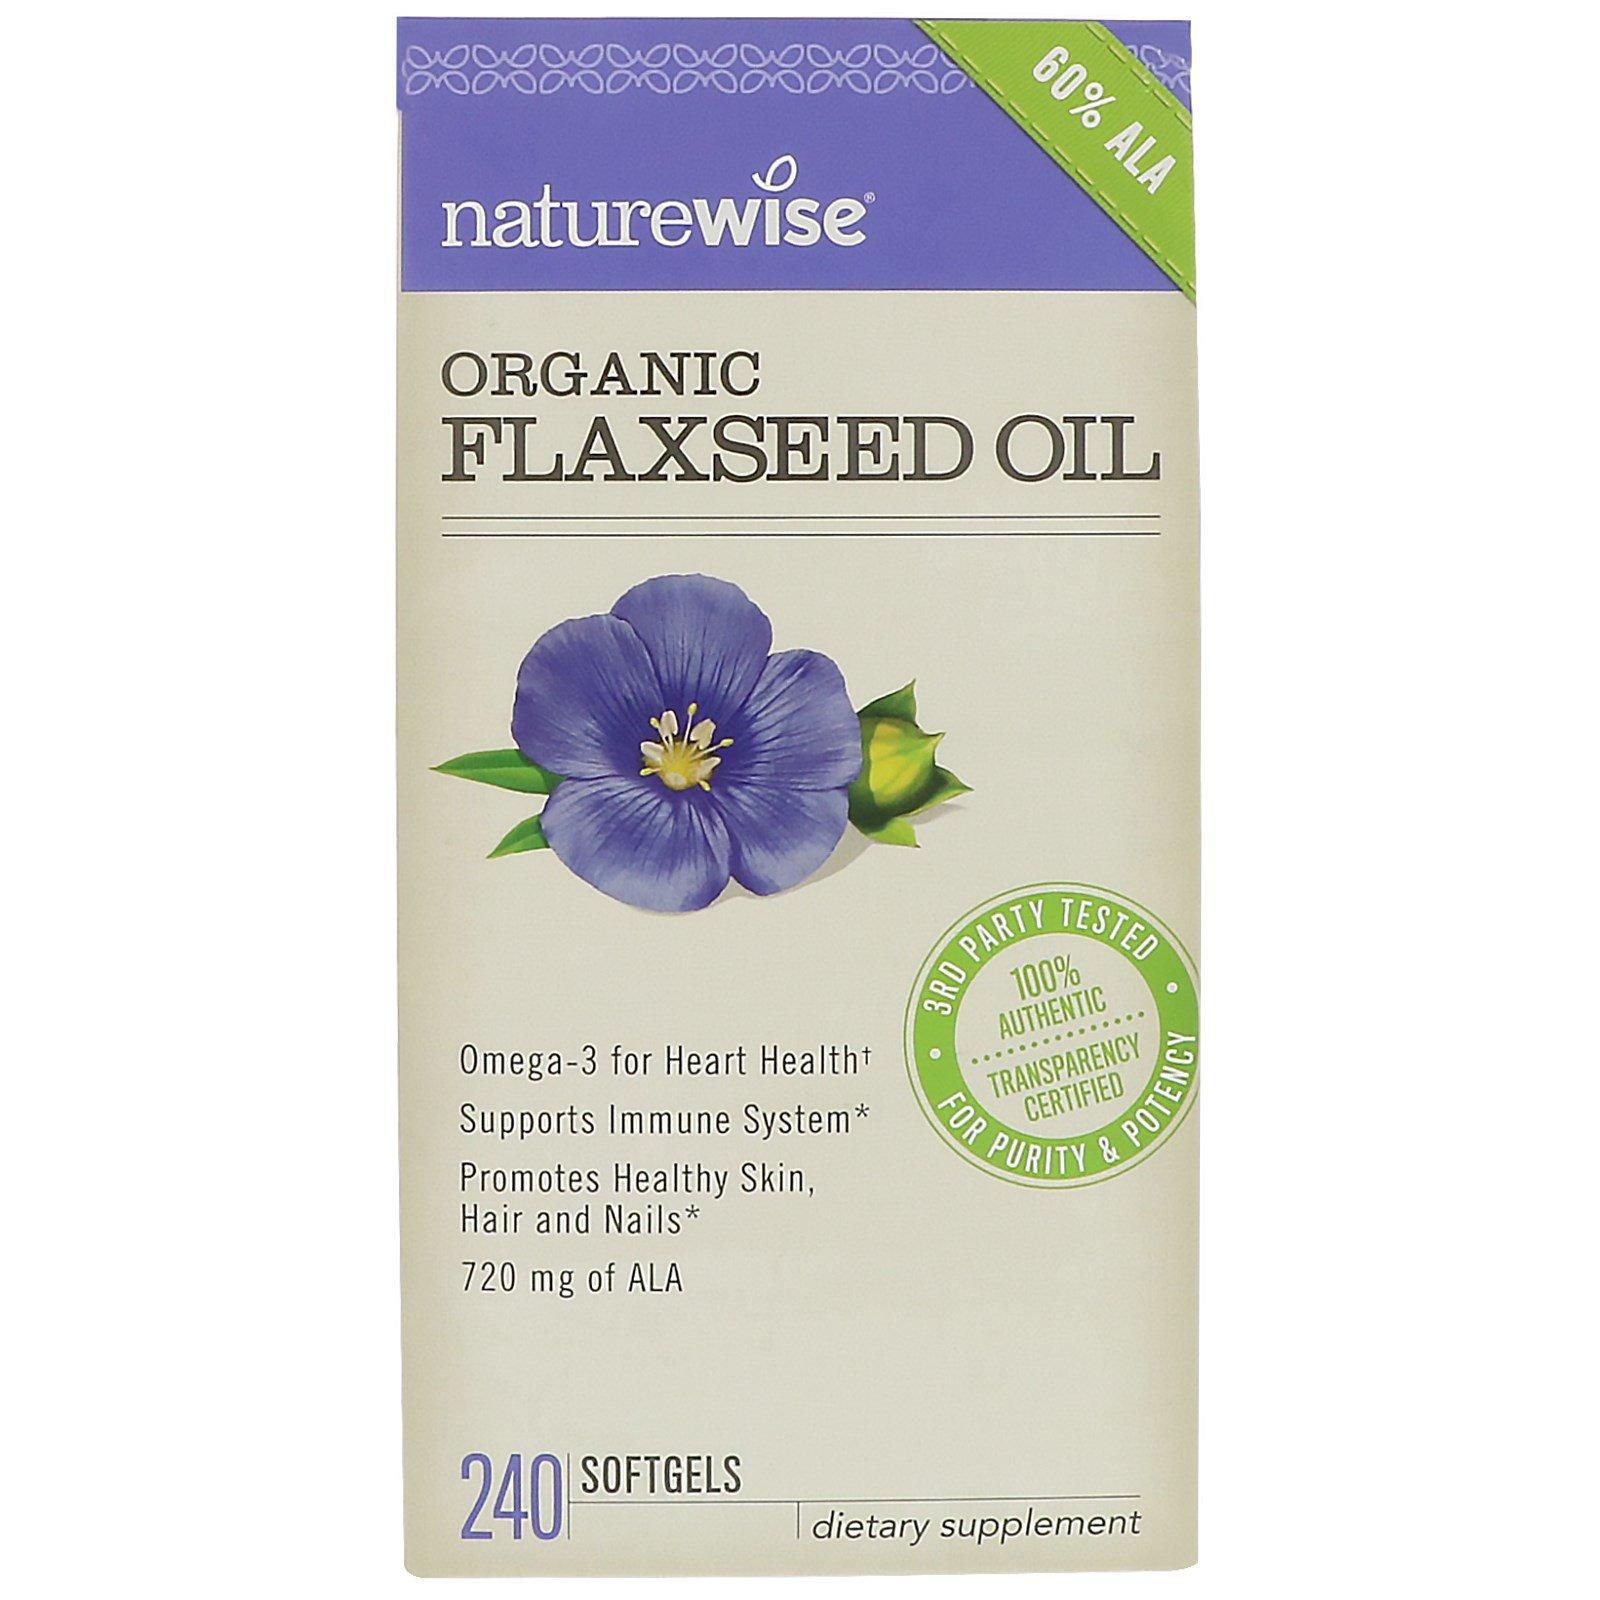 NatureWise, Organic Flaxseed Oil, 240 Softgels